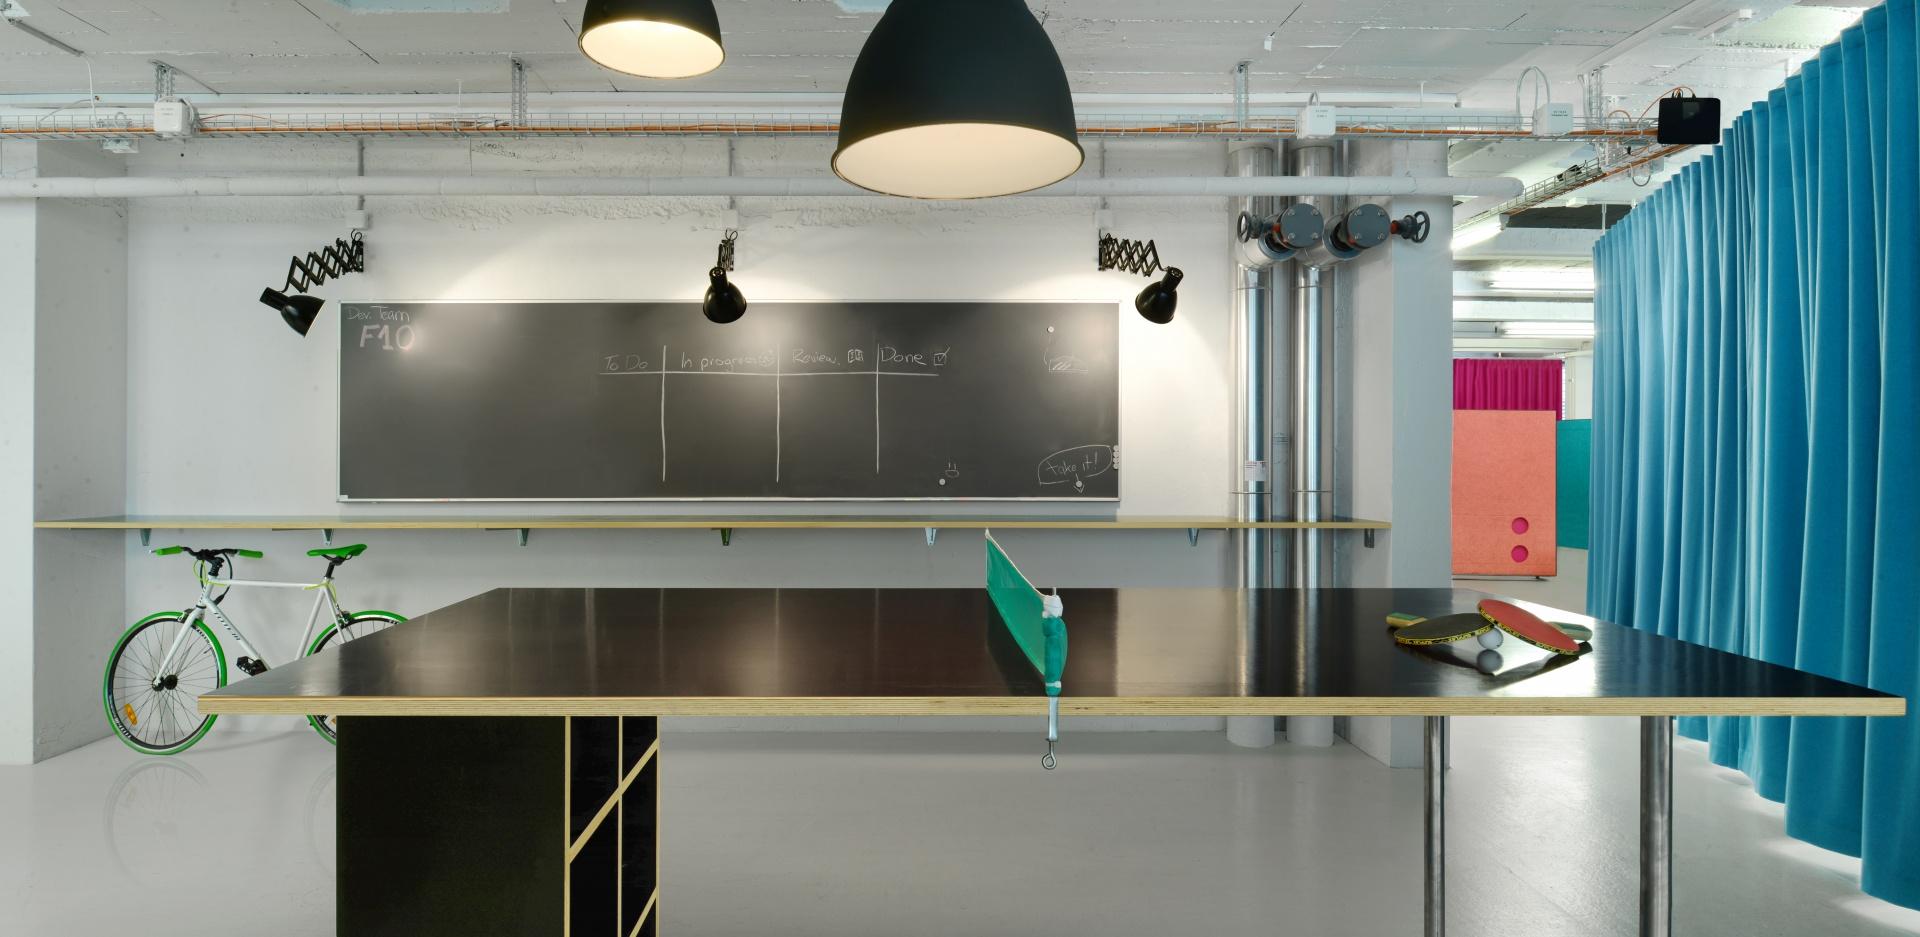 BISTRO 2 © Daluz Gonzalez & Cajos Architekten